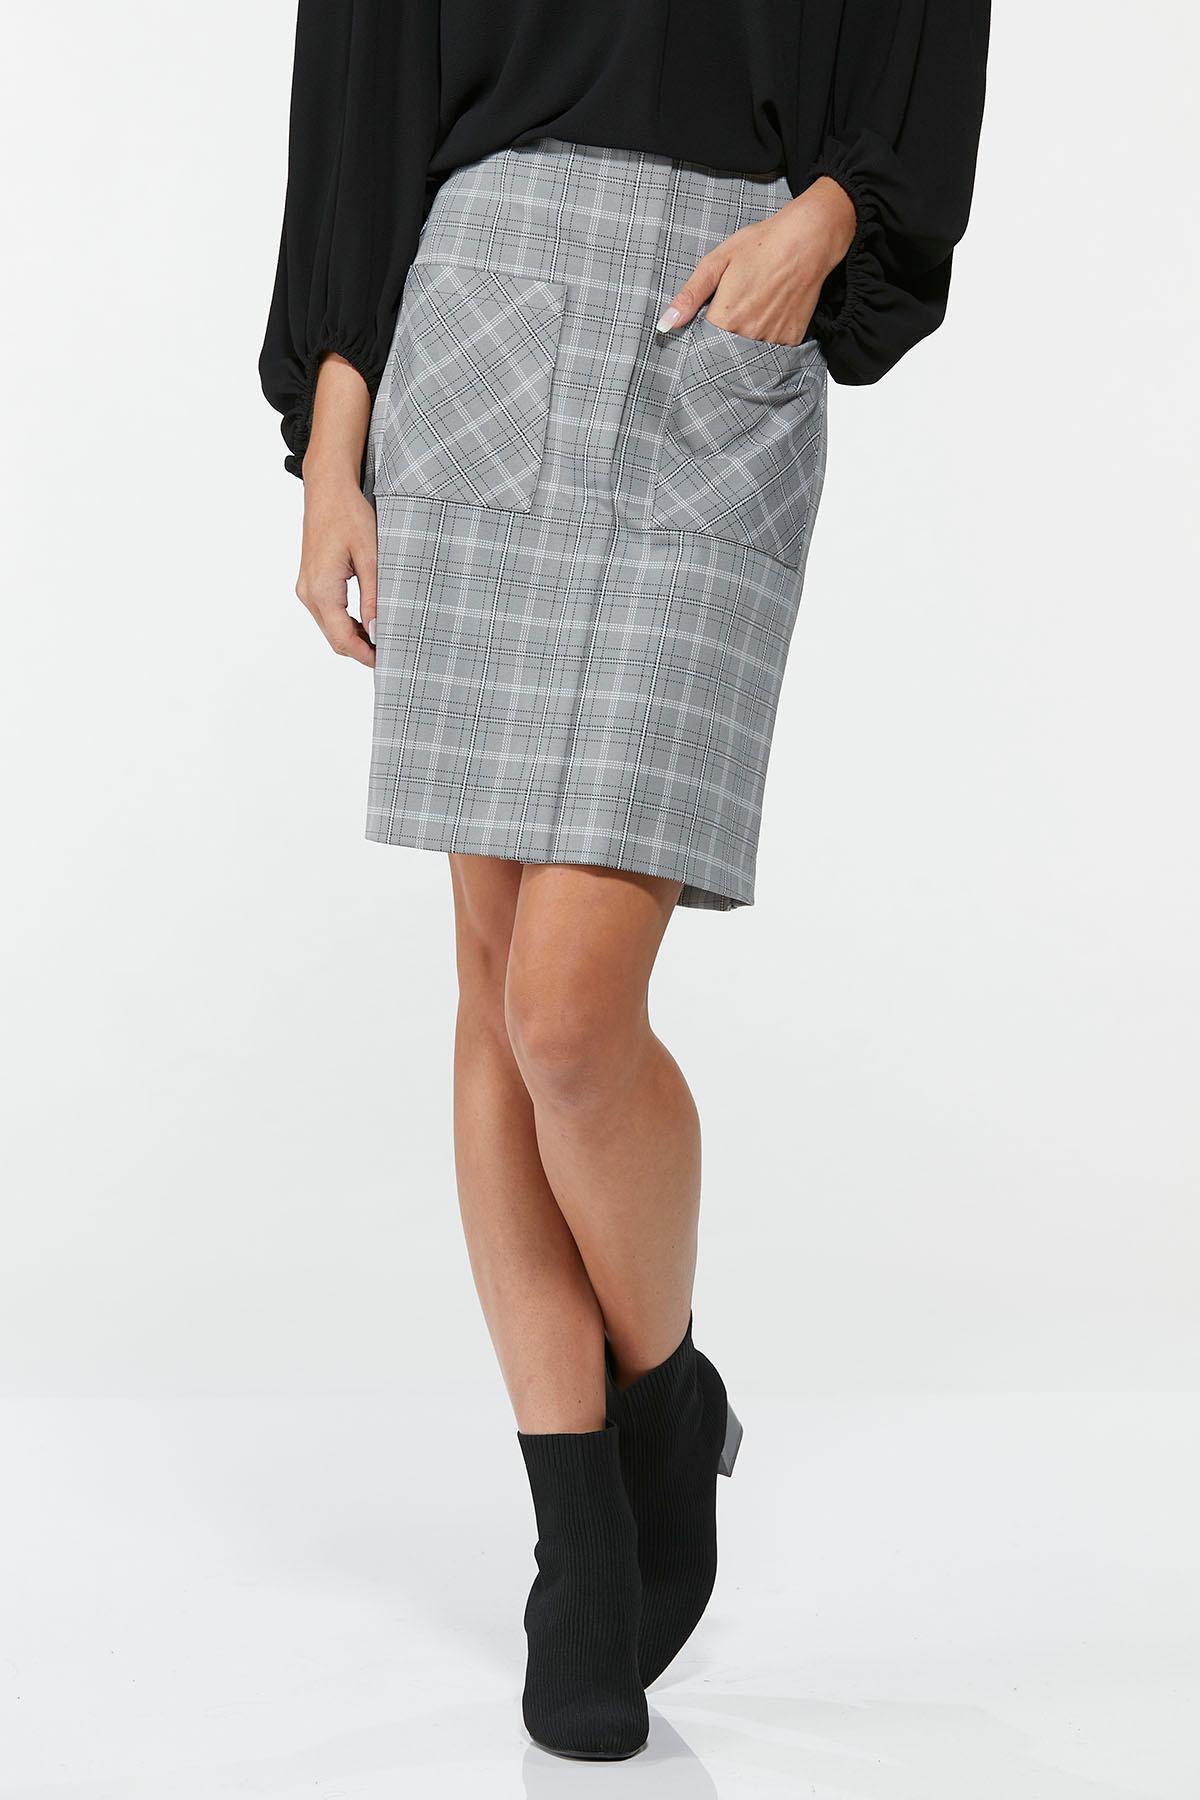 Gray Plaid Mini Skirt